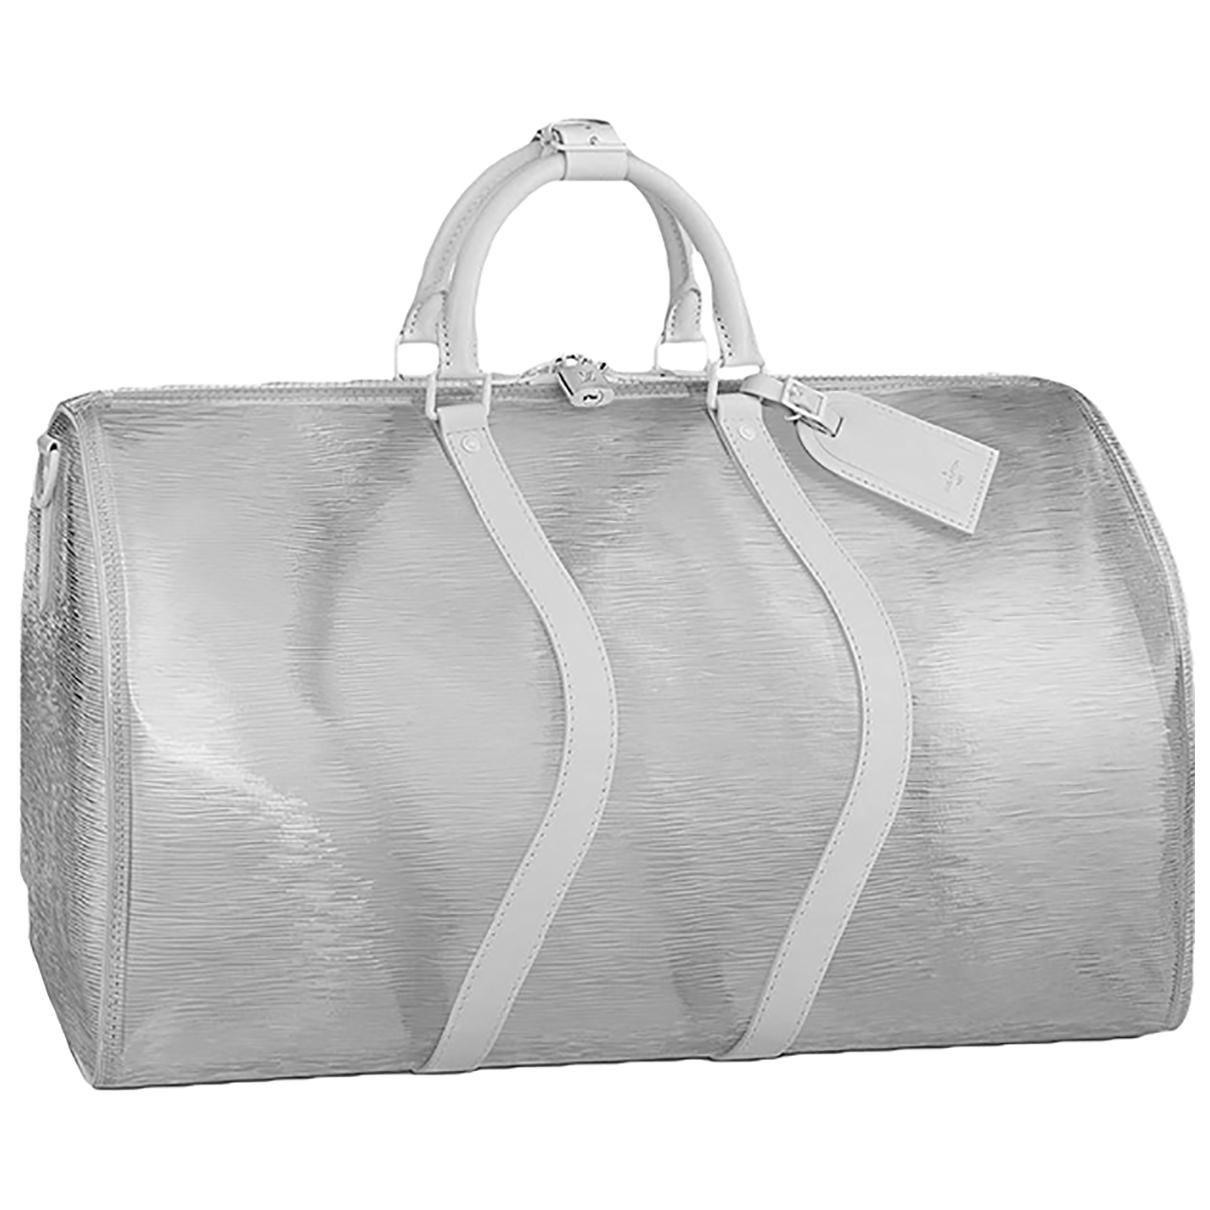 Bolso de viaje Keepall Louis Vuitton